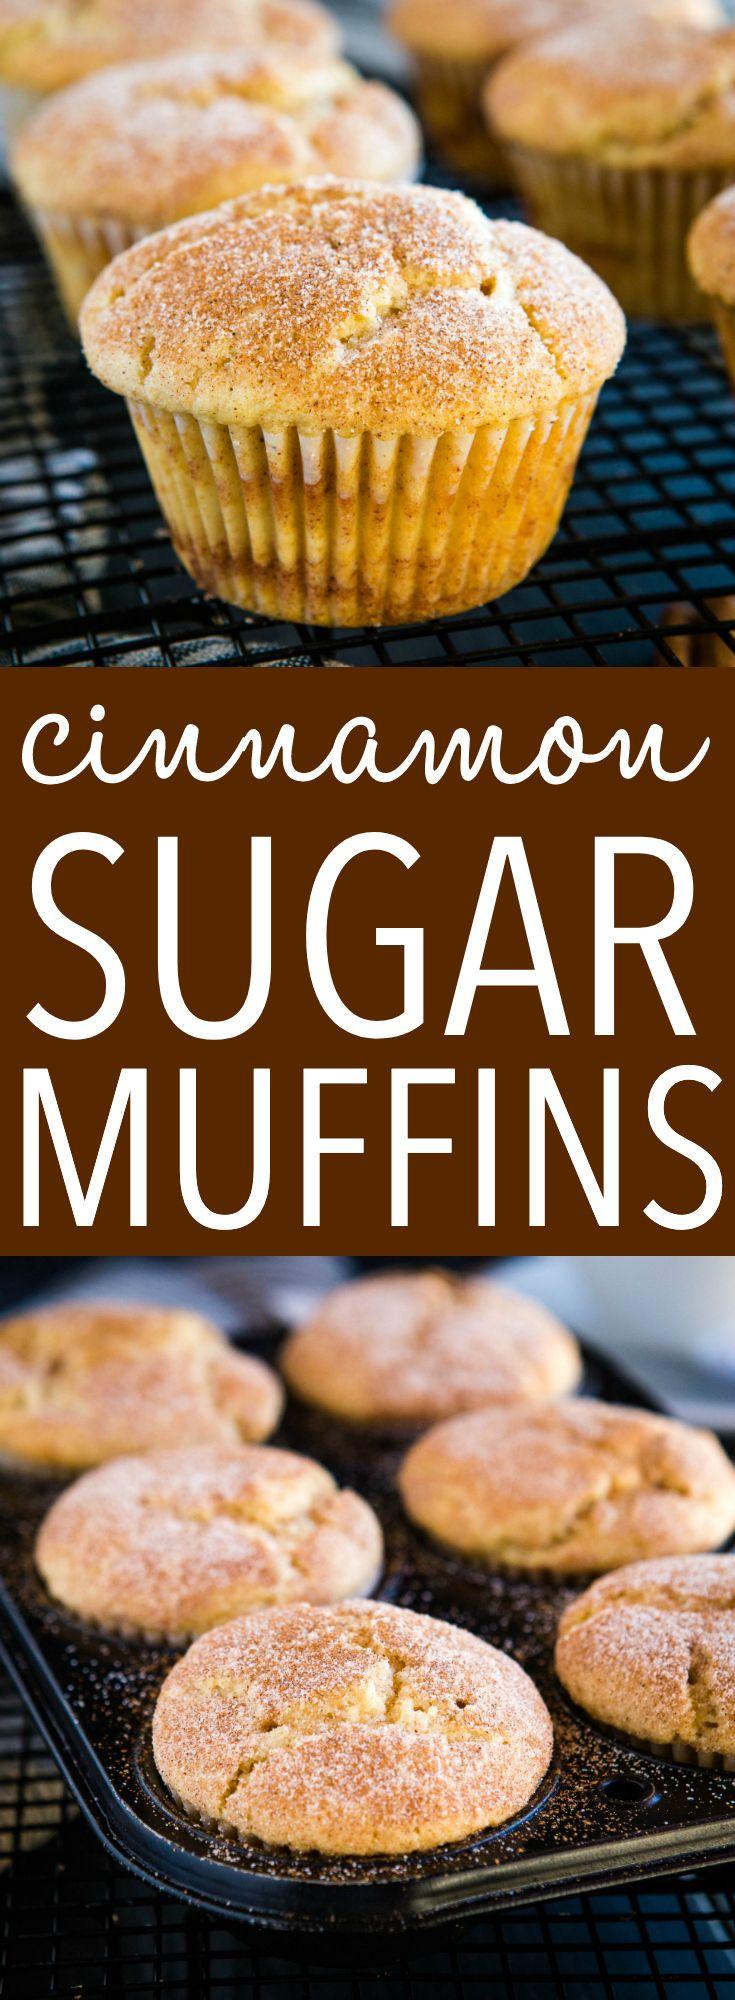 Photo of Cinnamon Sugar Muffins